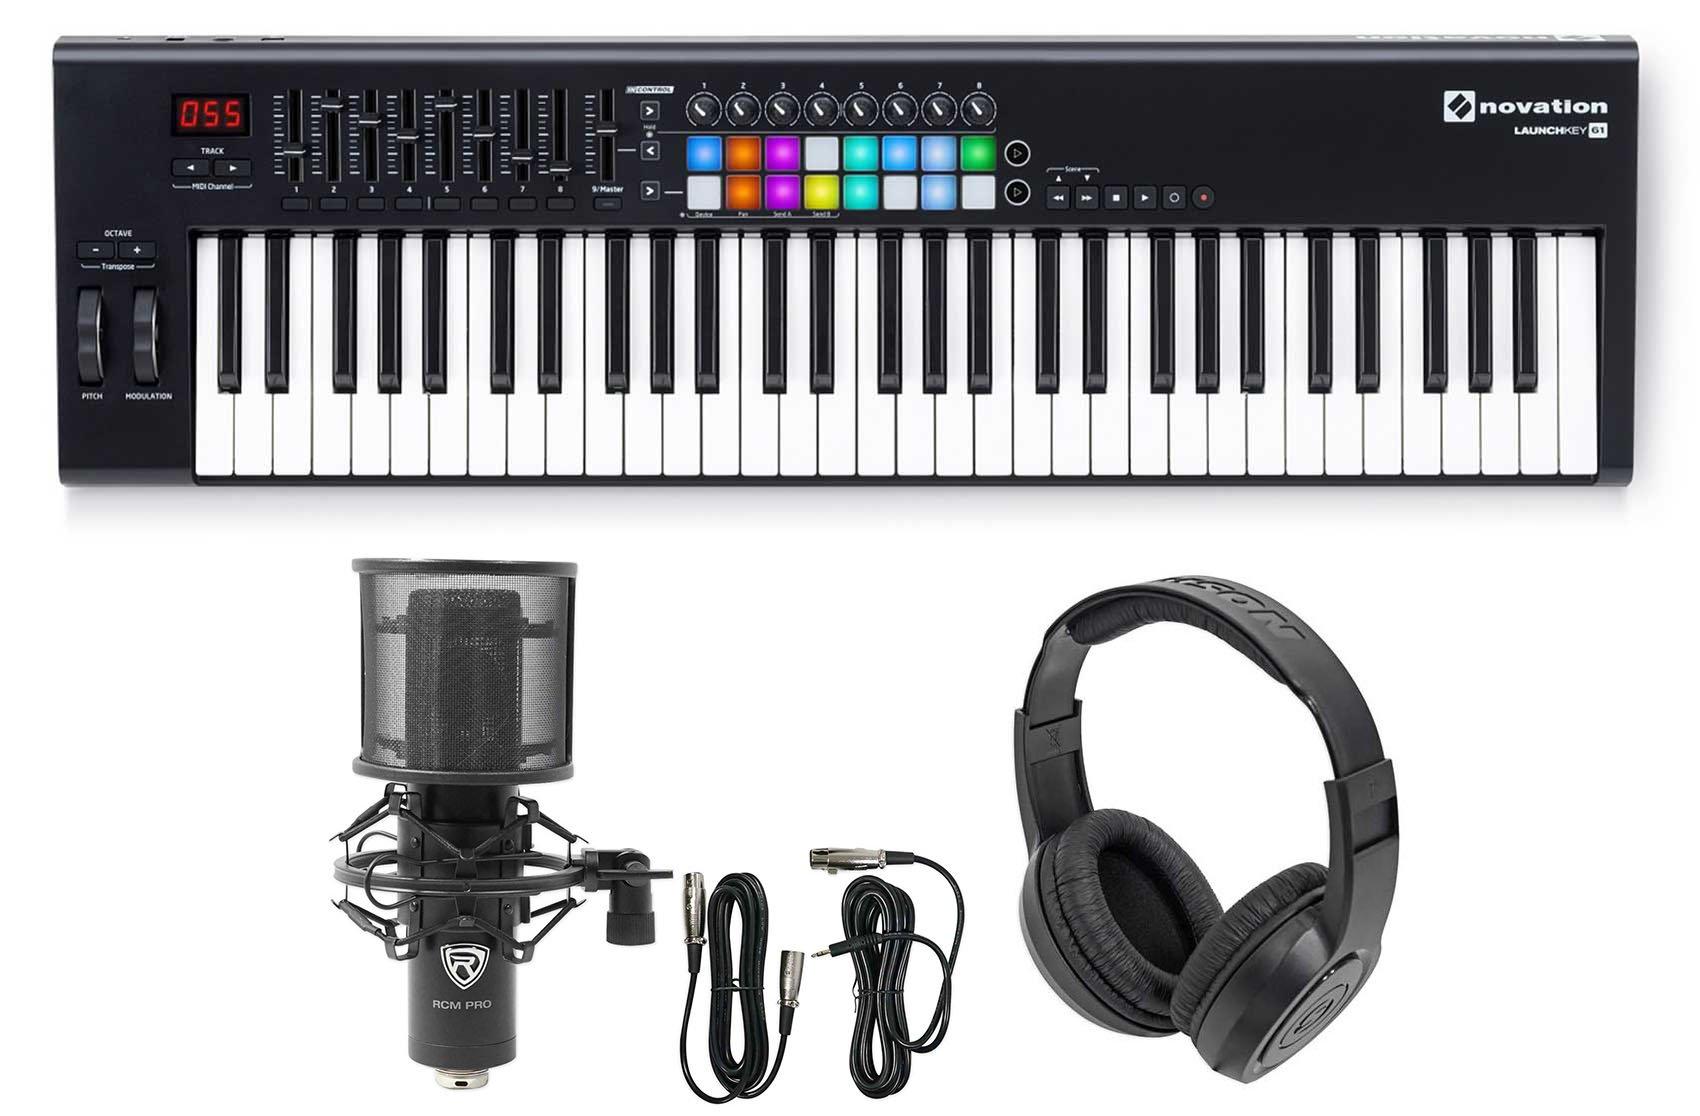 Novation LAUNCHKEY 61 MK2 MK11 61-Key USB Controller Keyboard+Mic and Headphones